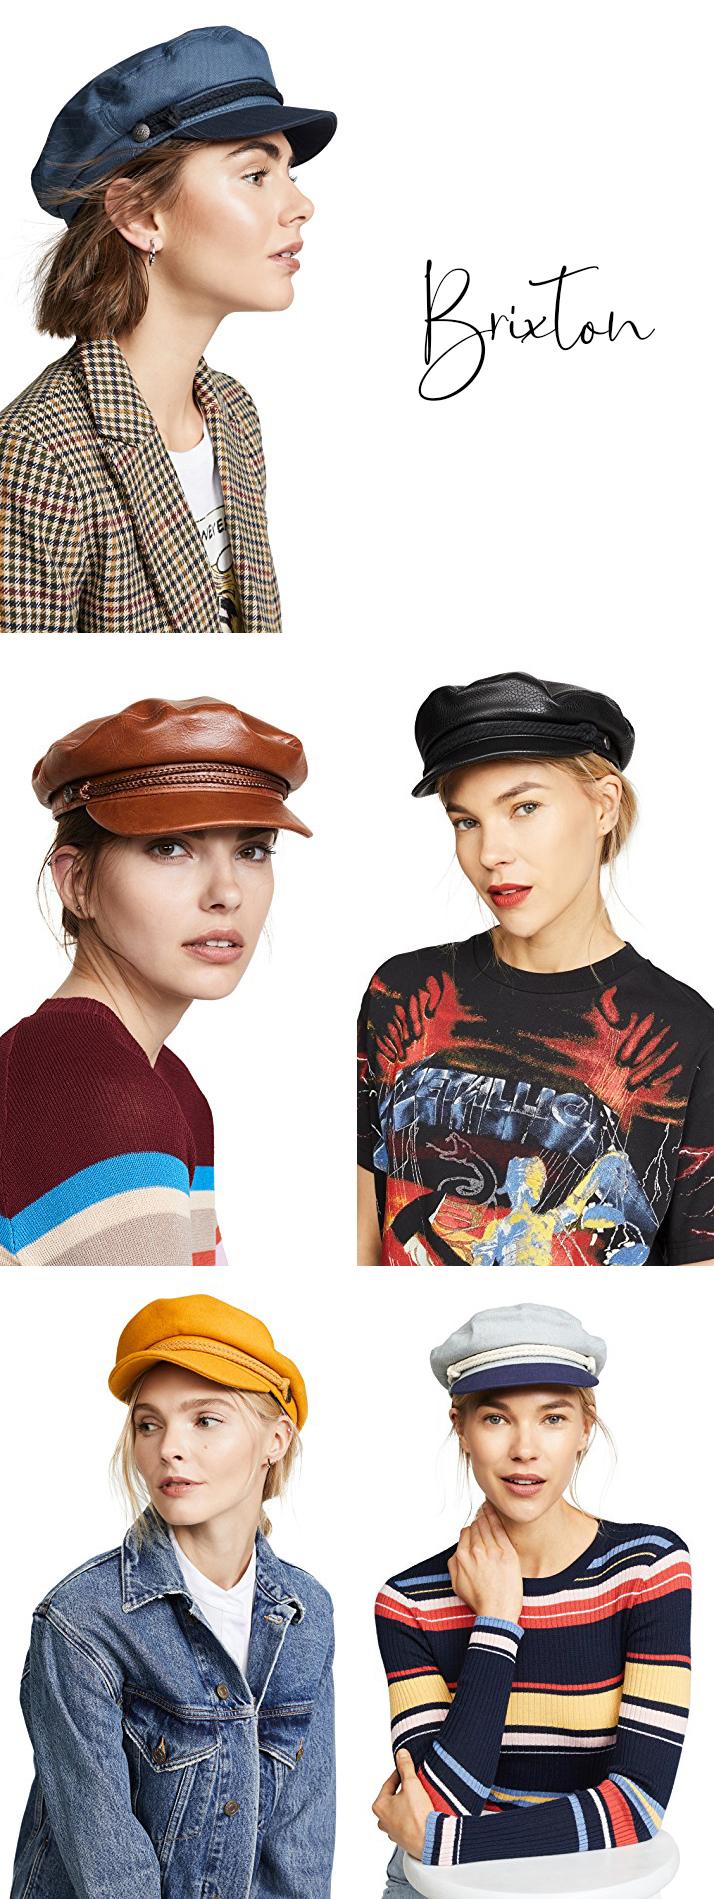 Brixton baker hat cappello da capitano